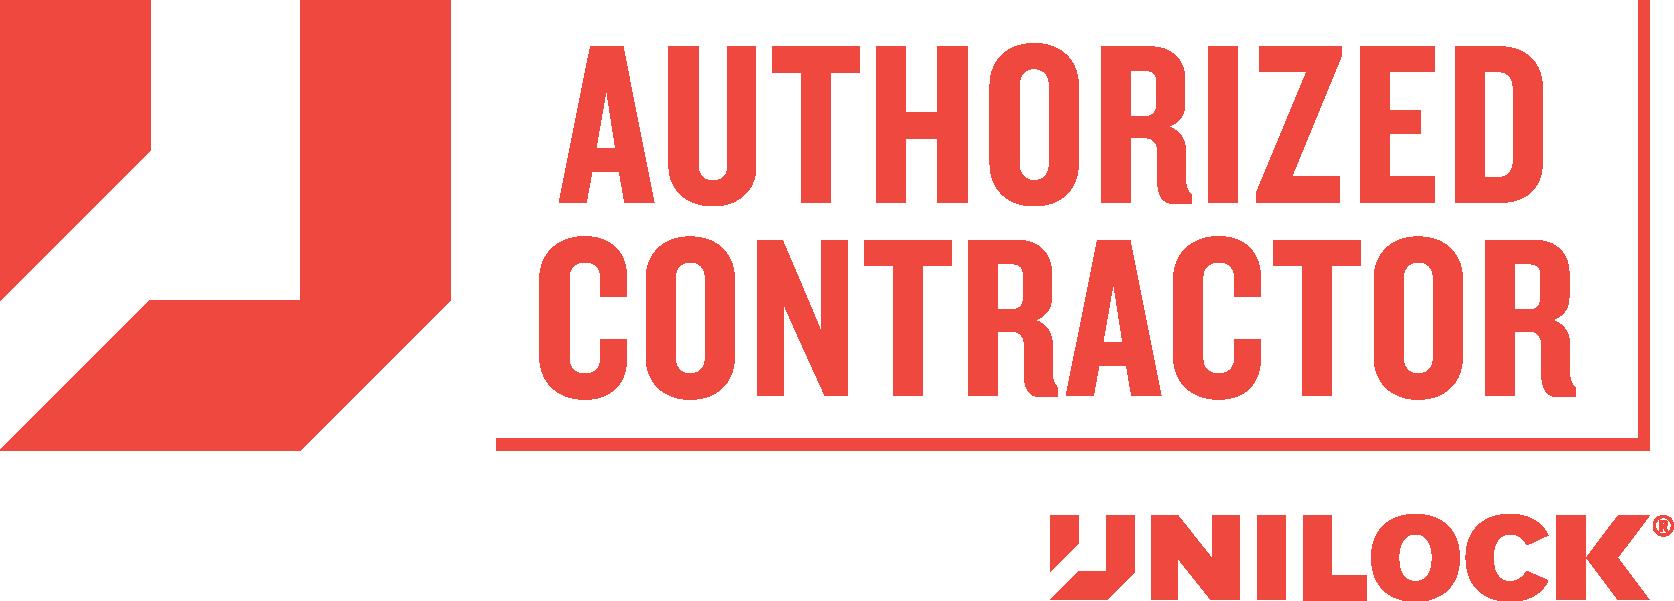 Unilock Authorized Hardscape Contractor in Skokie, IL